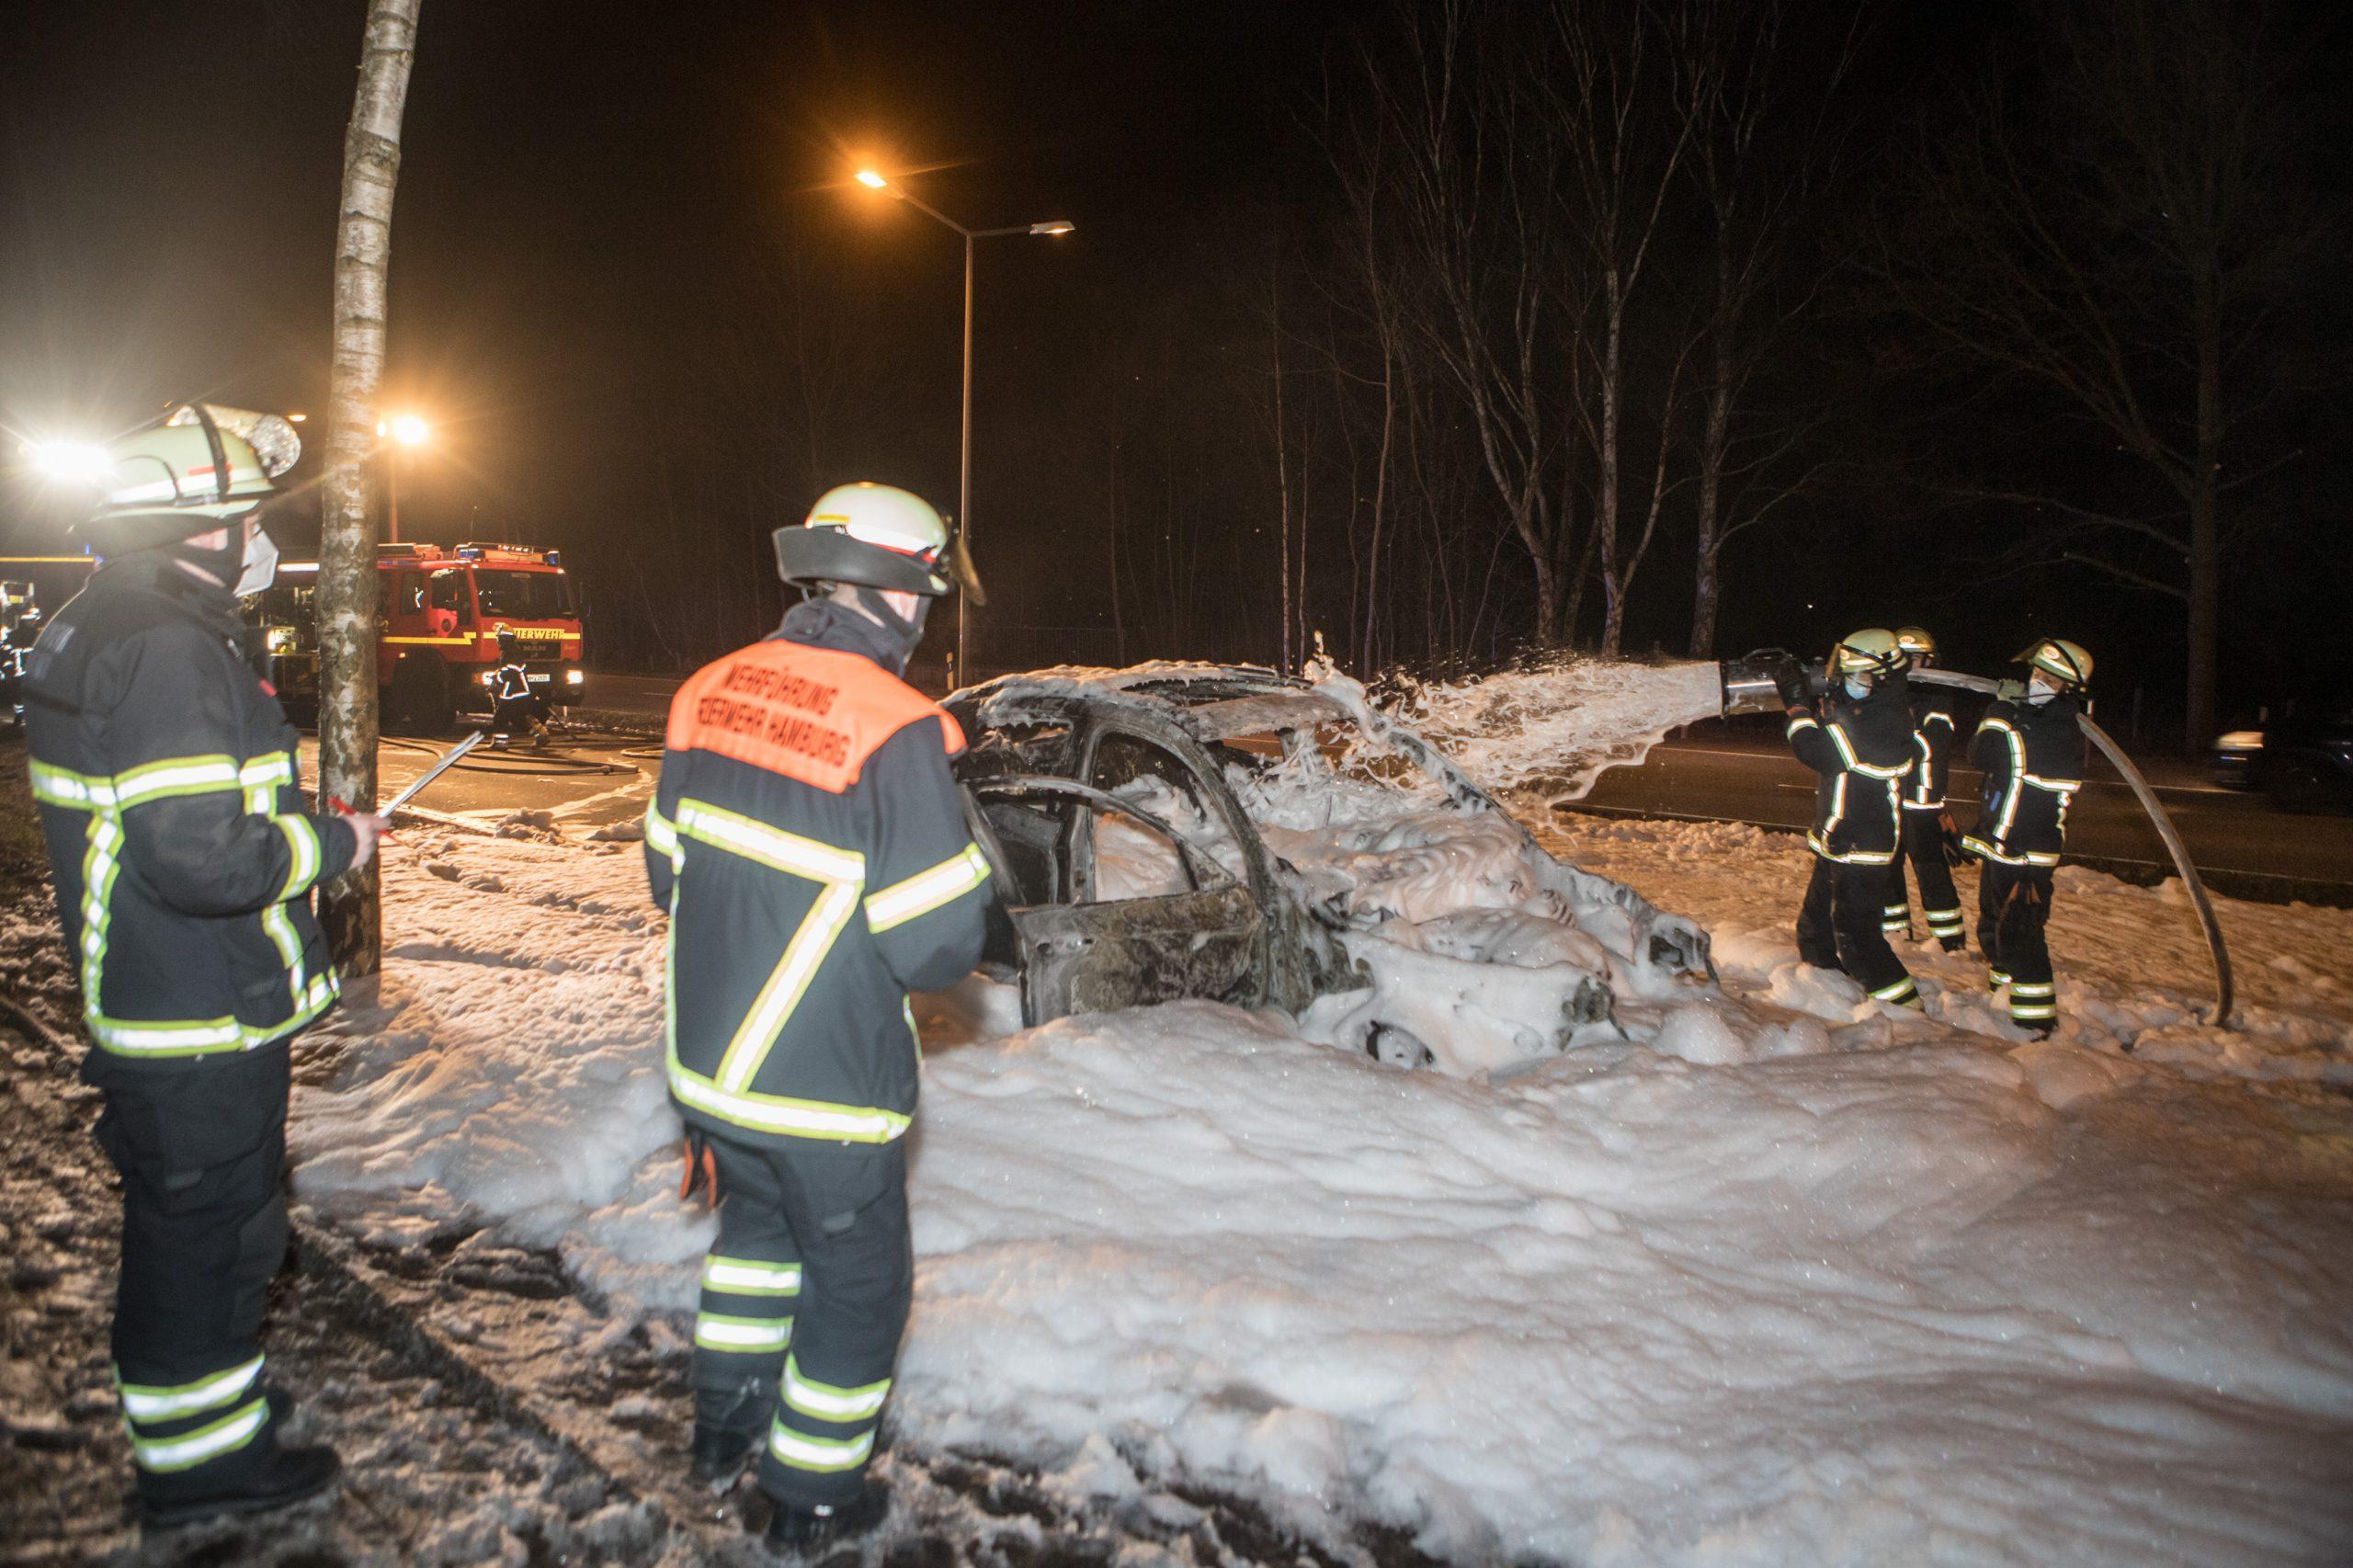 D-nischer-BMW-abgefackelt-Fahrer-konnte-Fahrzeug-noch-rechtzeitig-verlassen